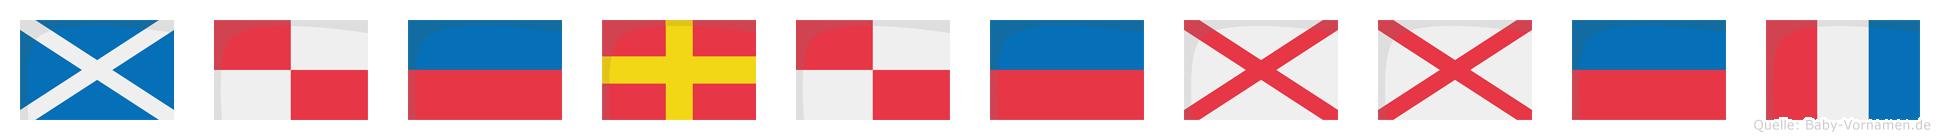 Mürüvvet im Flaggenalphabet